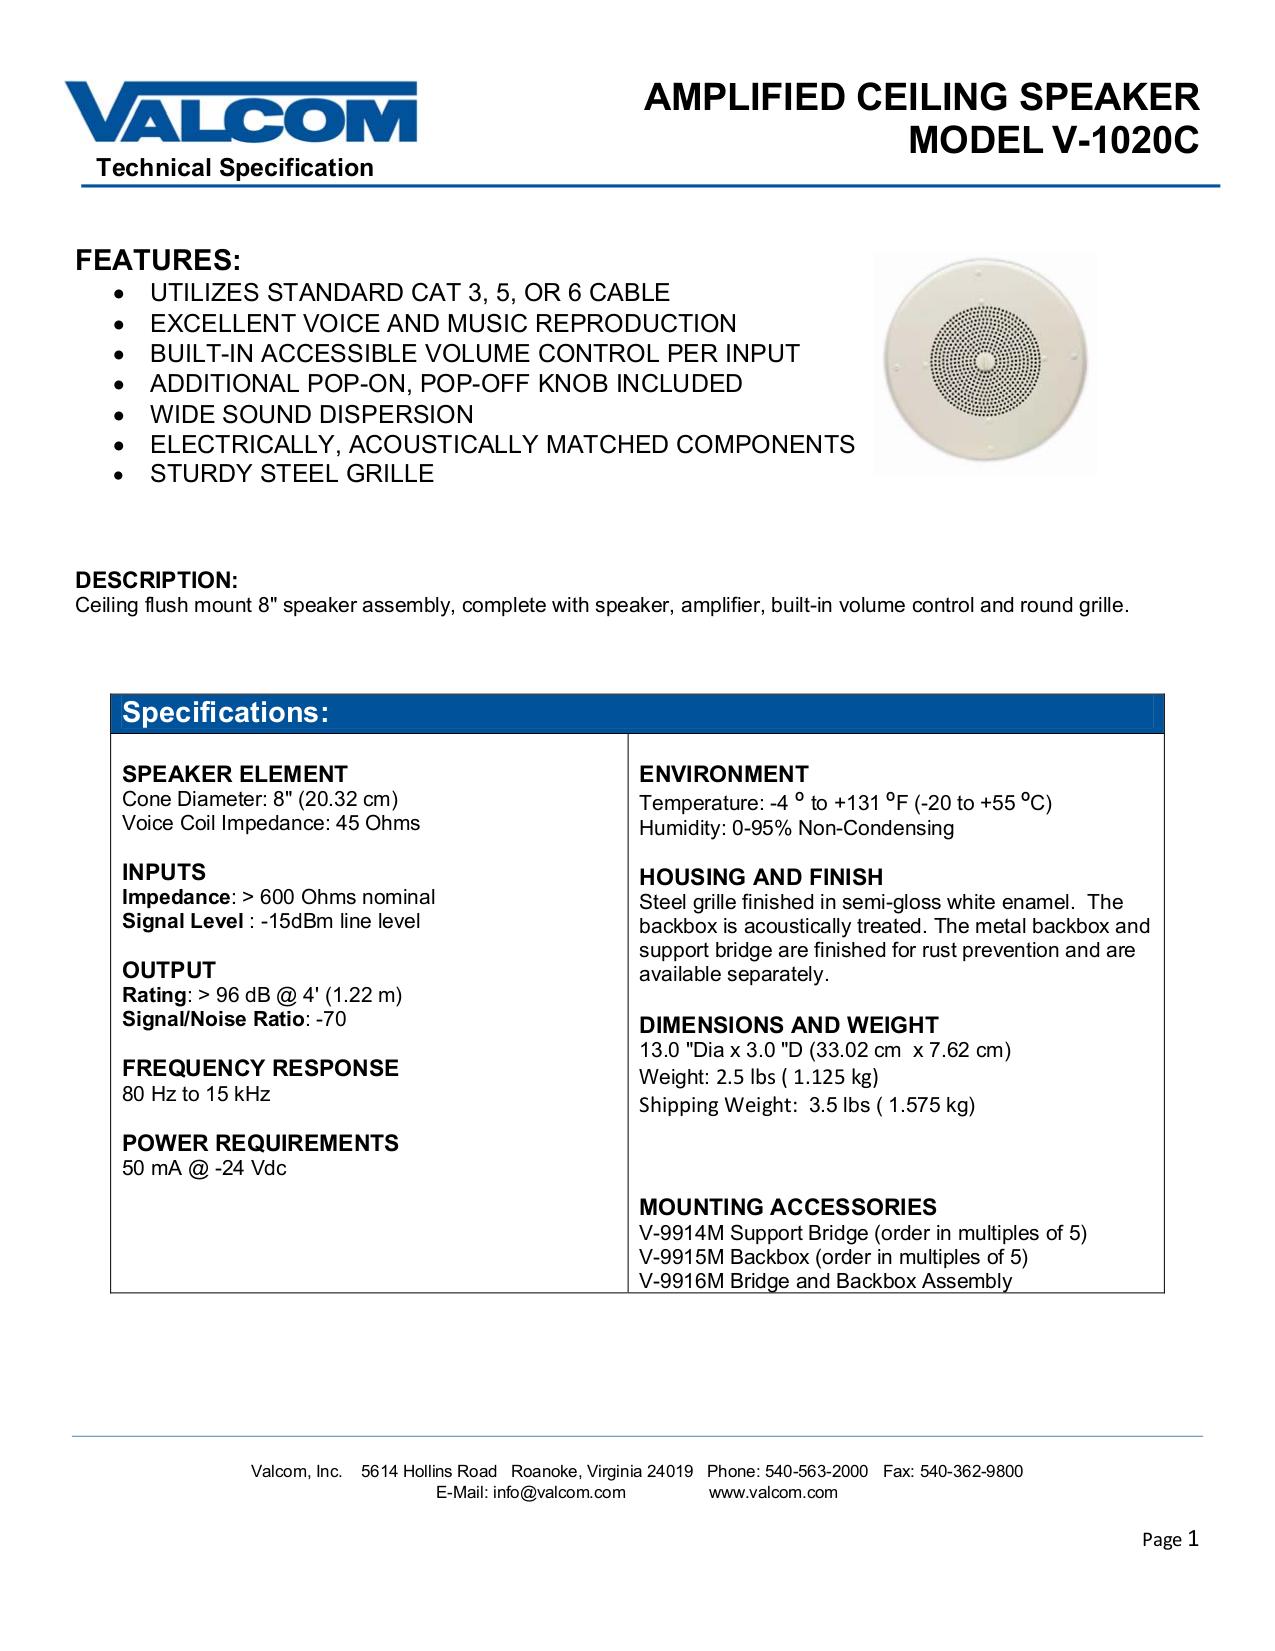 Bogen Paging System Wiring Diagram